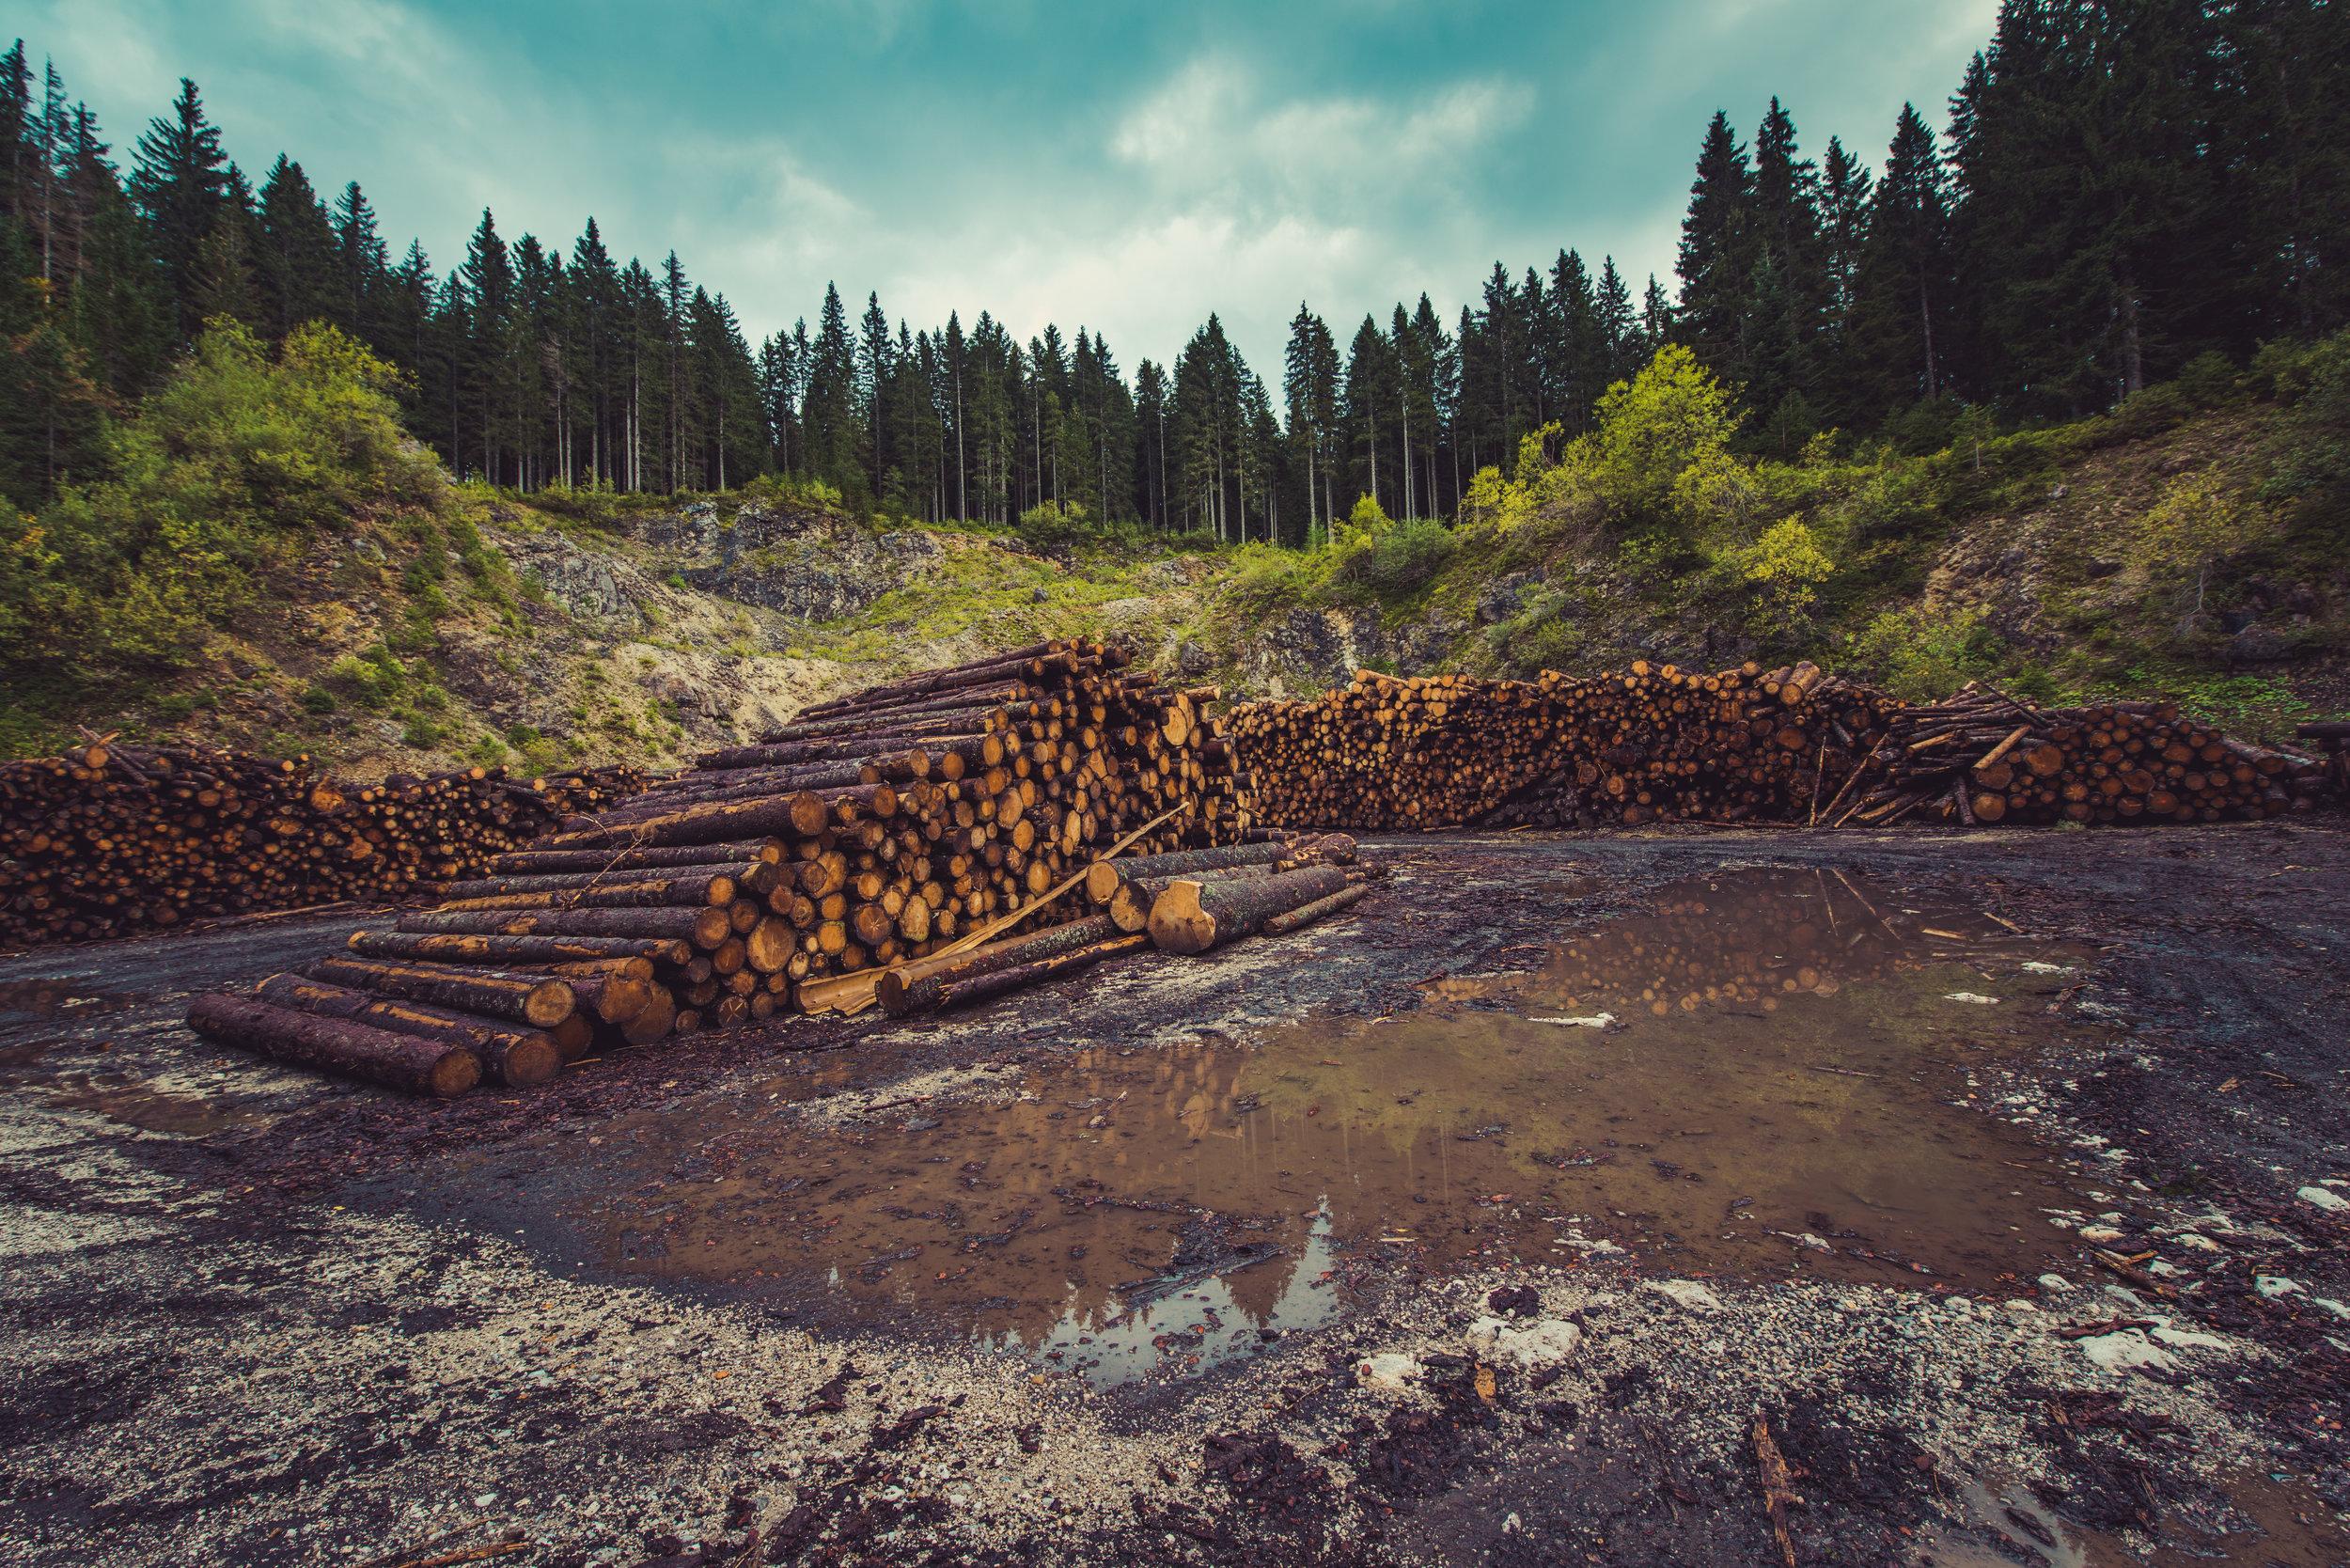 Destruction of our forests removes a critical carbon dioxide  sink  (plants eat carbon dioxide), exacerbating climate change. Photo credit: Ales Krivec